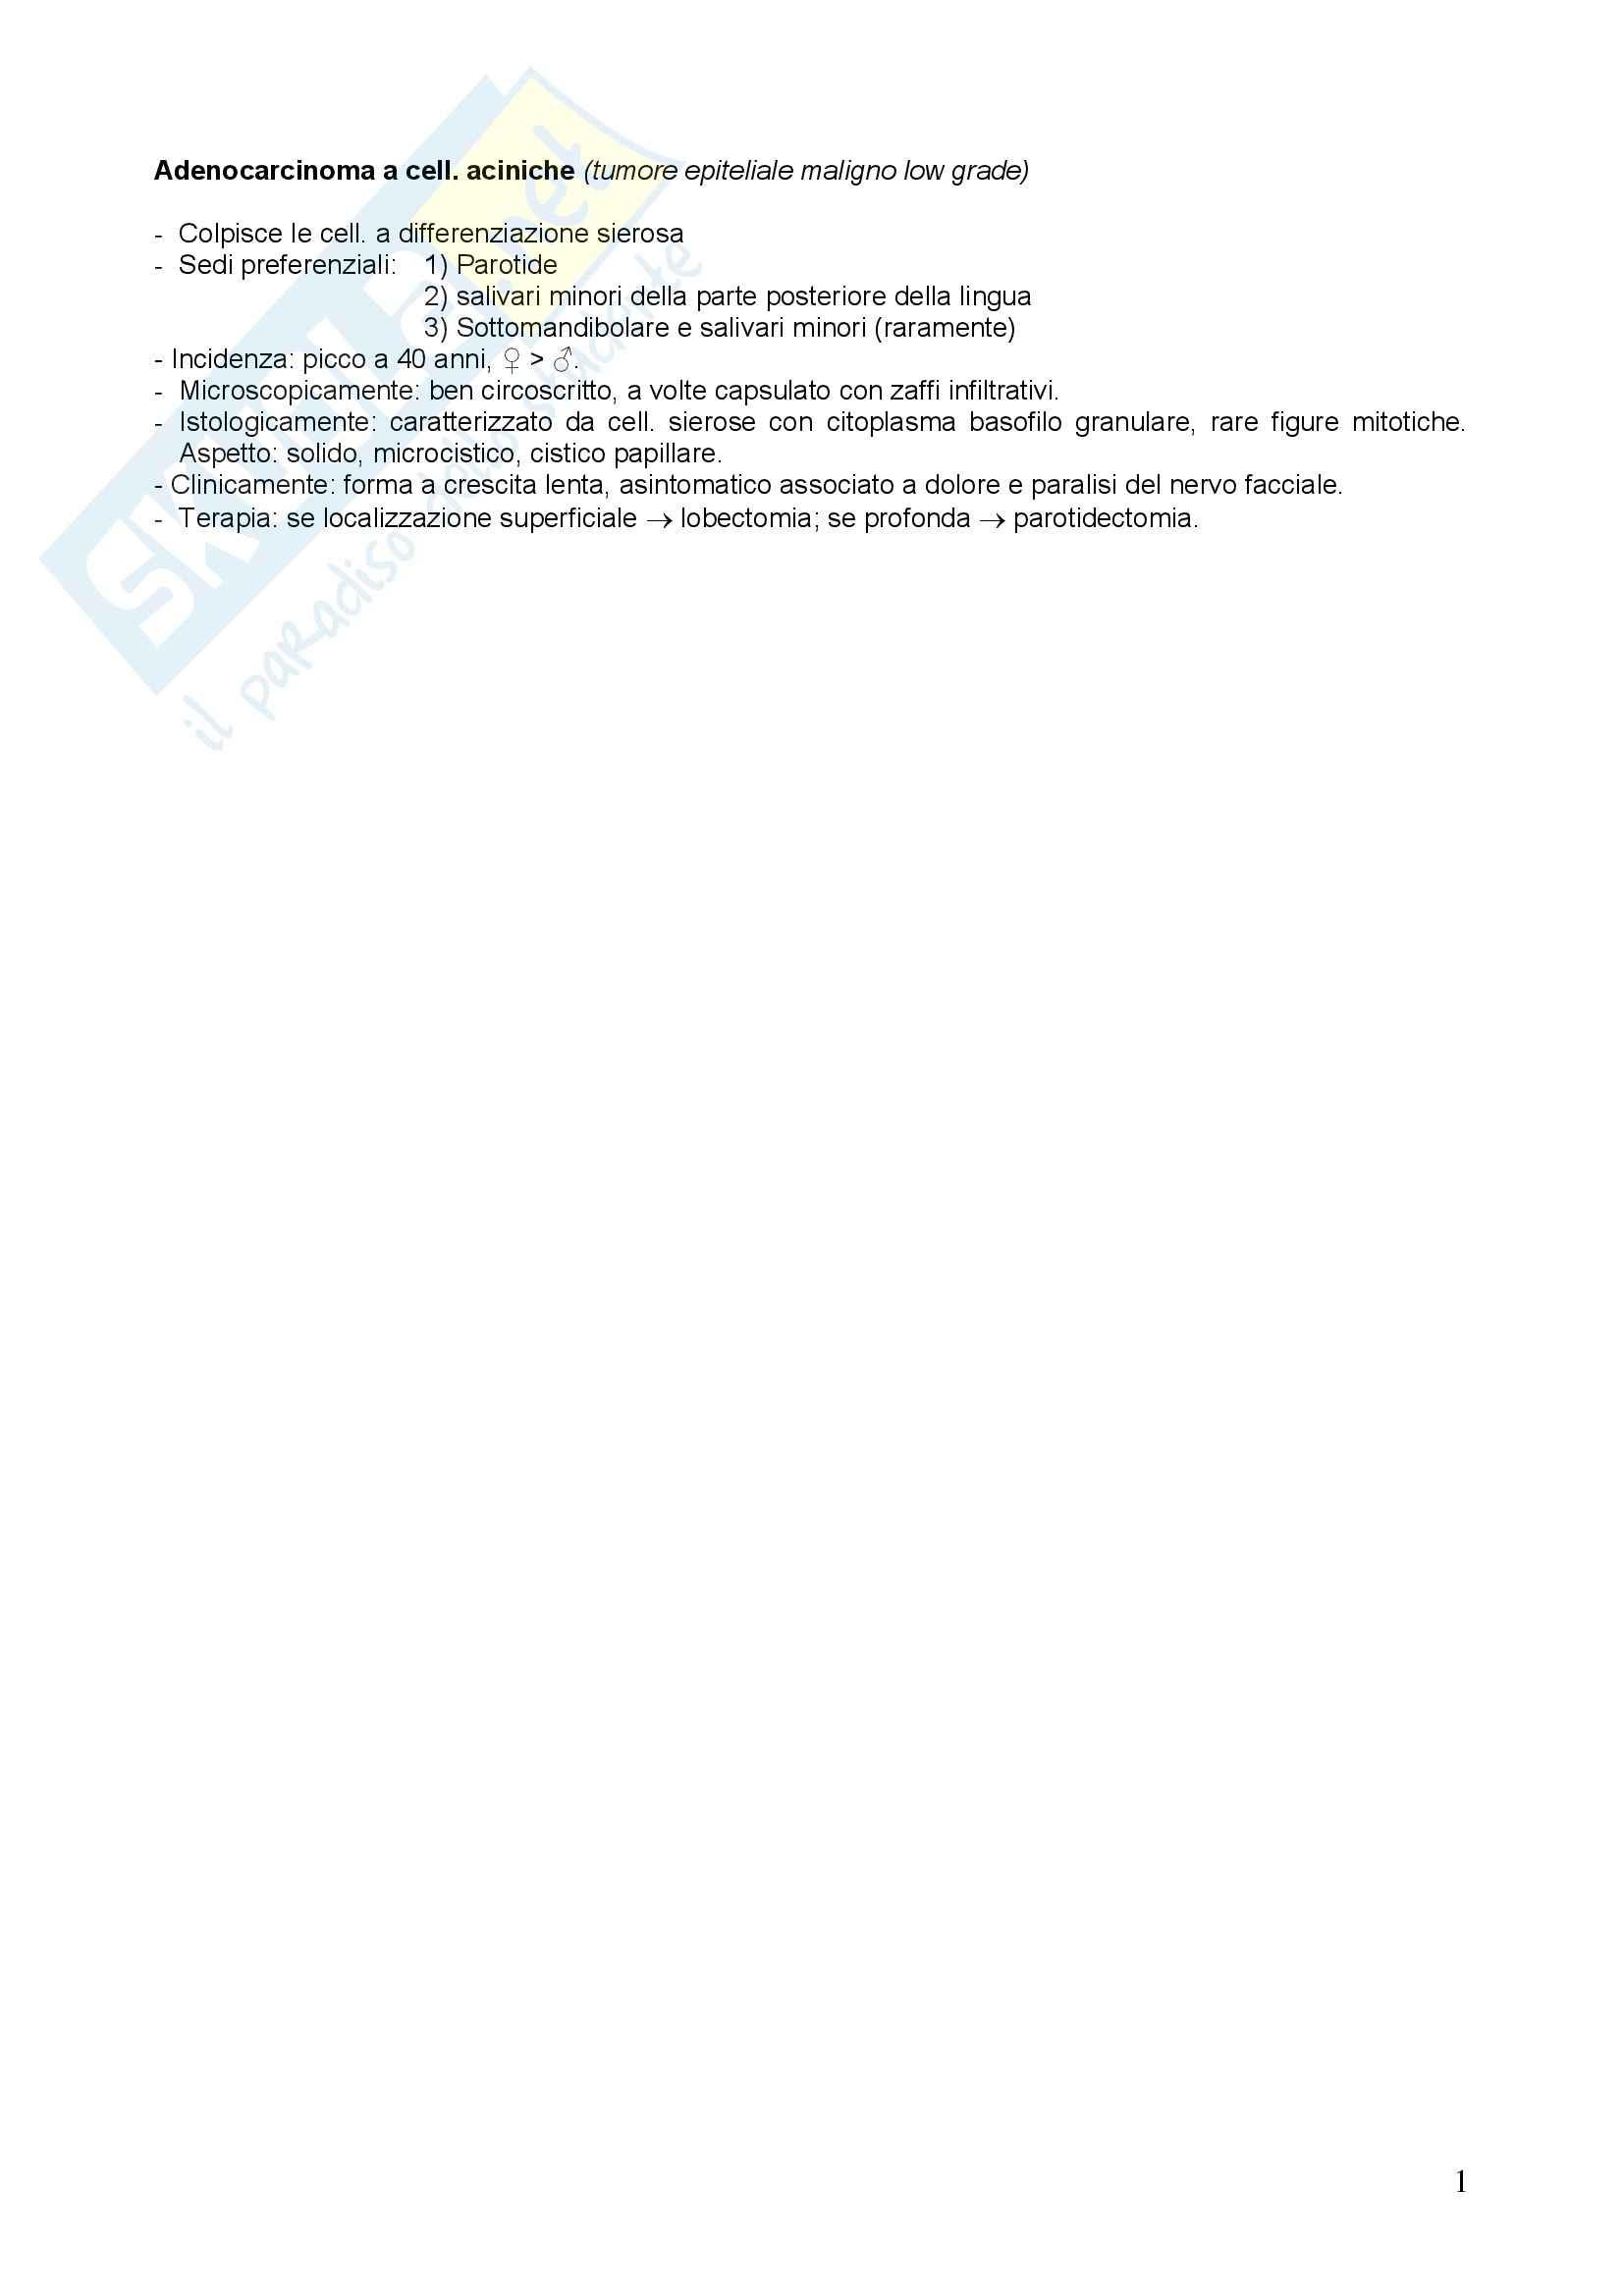 Anatomia patologica - adenocarcinoma a cellule aciniche